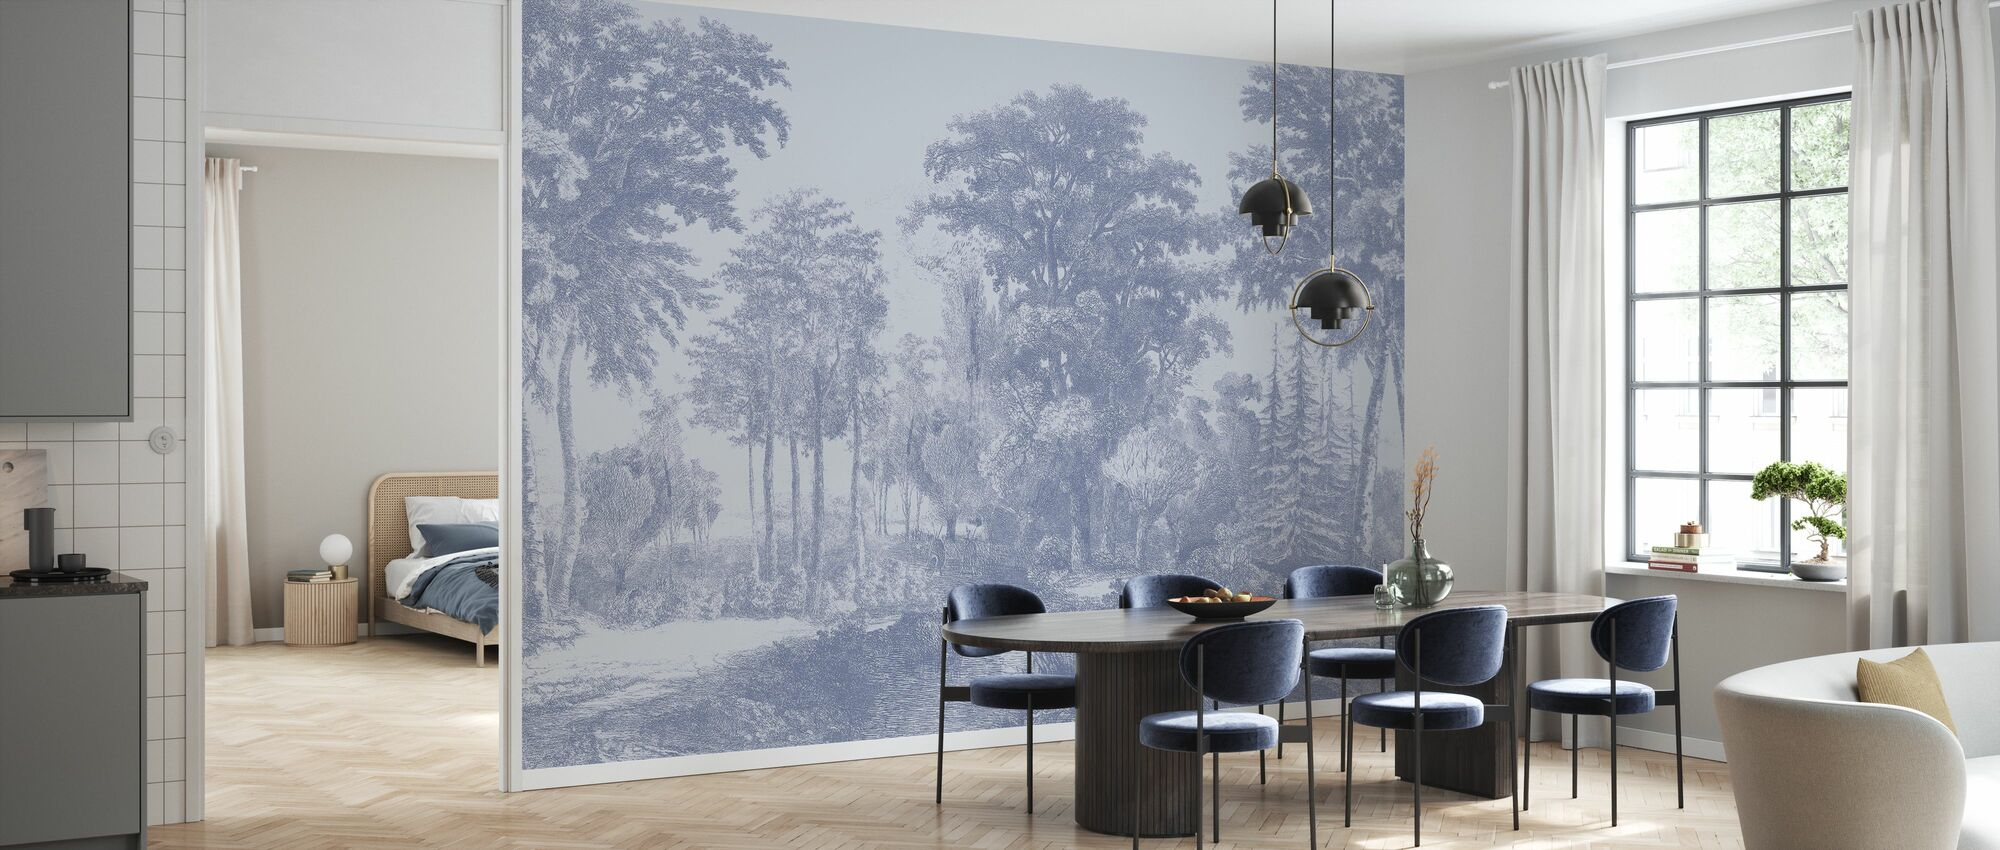 Slow Meander - Blue - Wallpaper - Kitchen